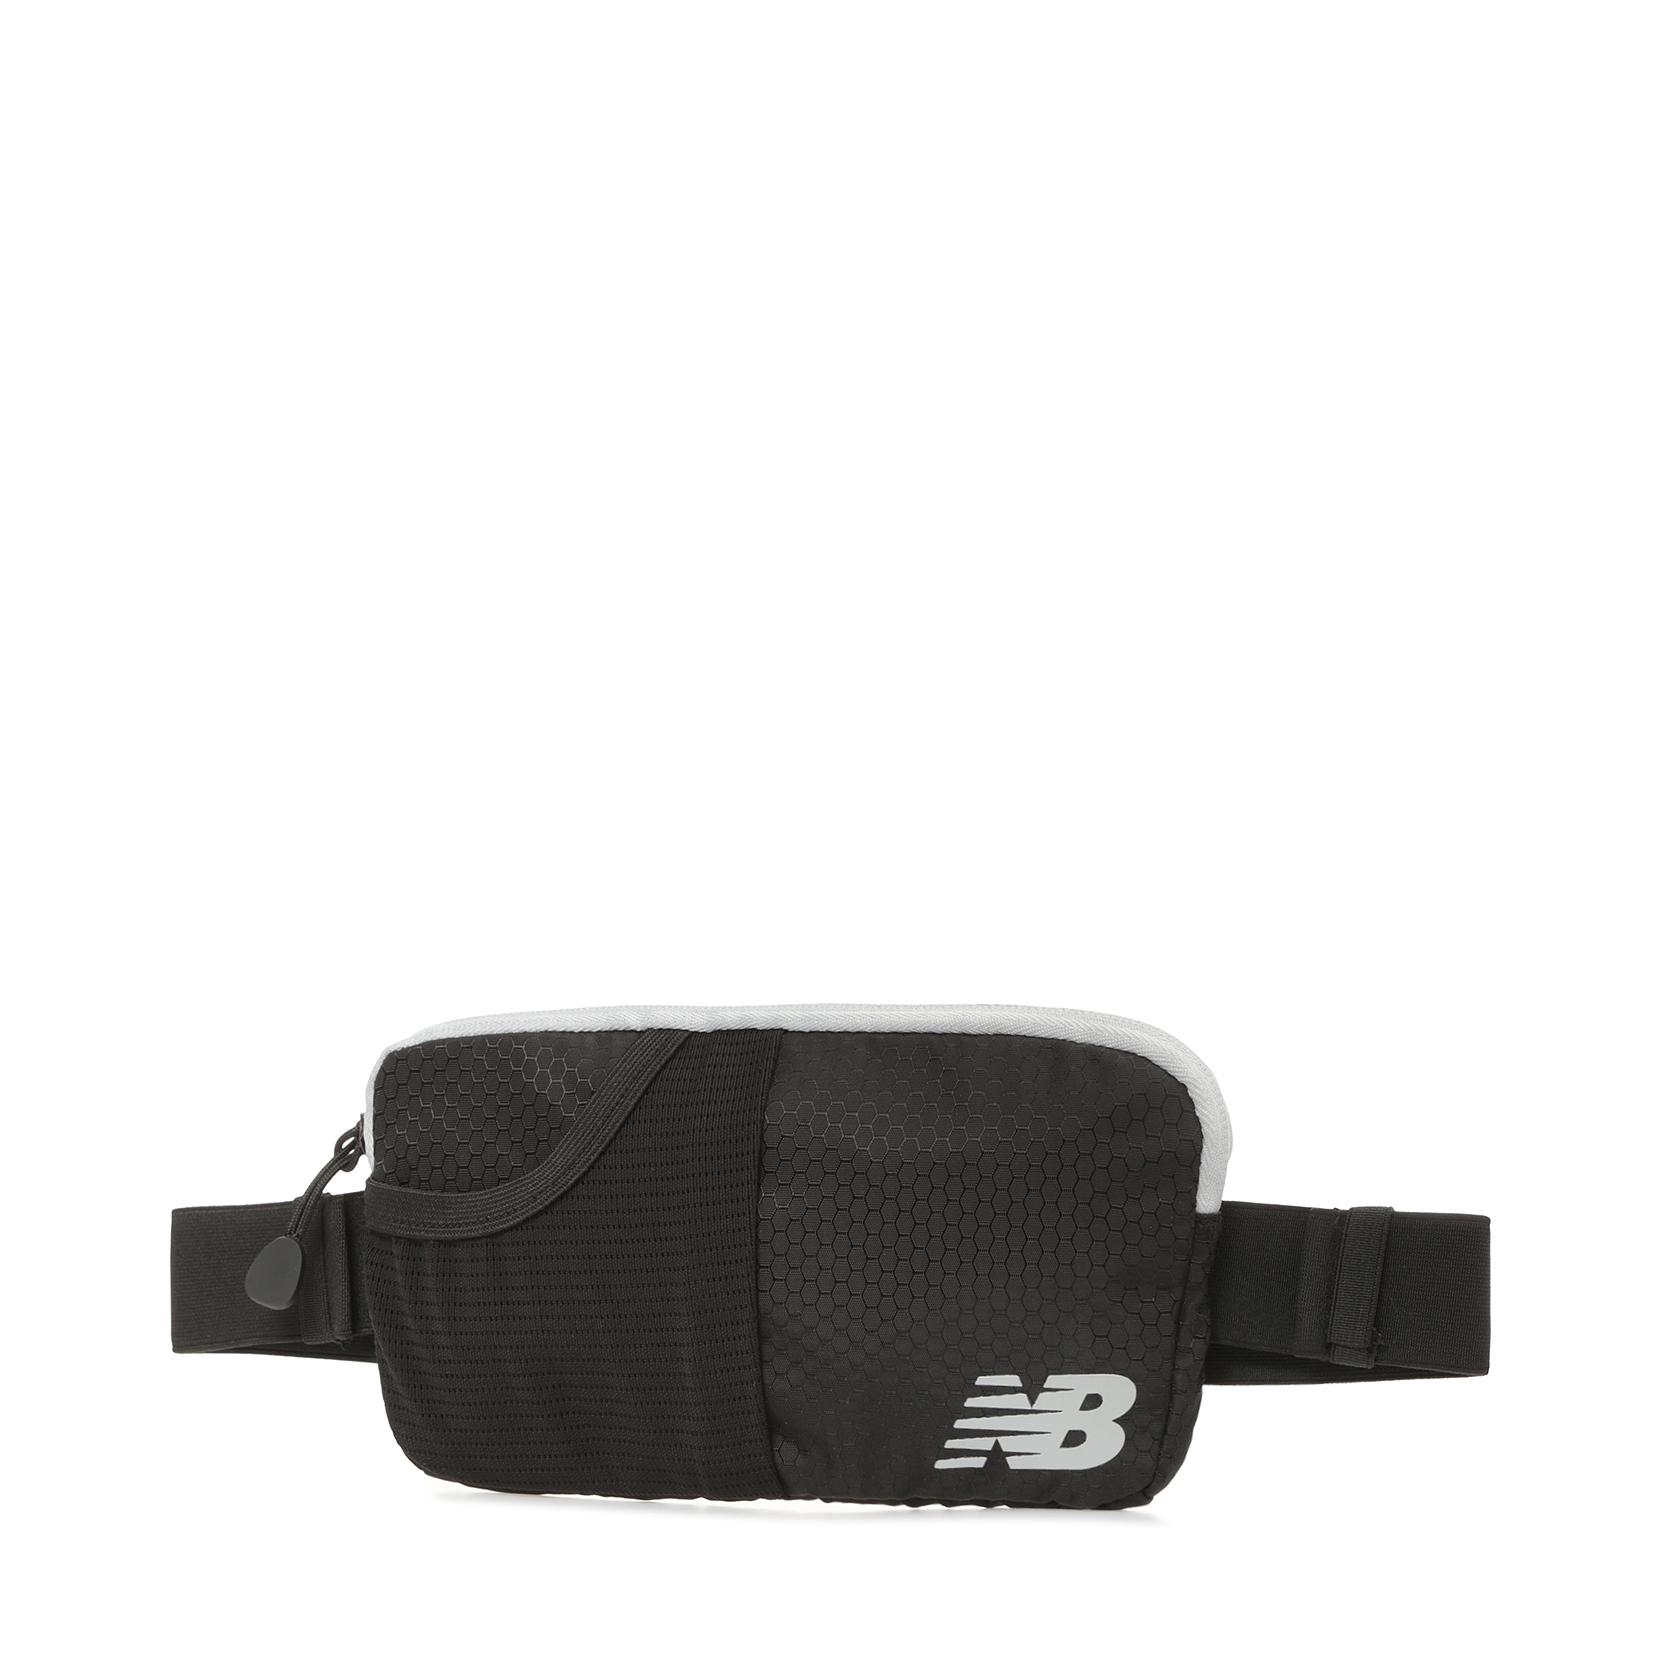 Поясна сумка Performance Waist Pack LAB91030BK | New Balance